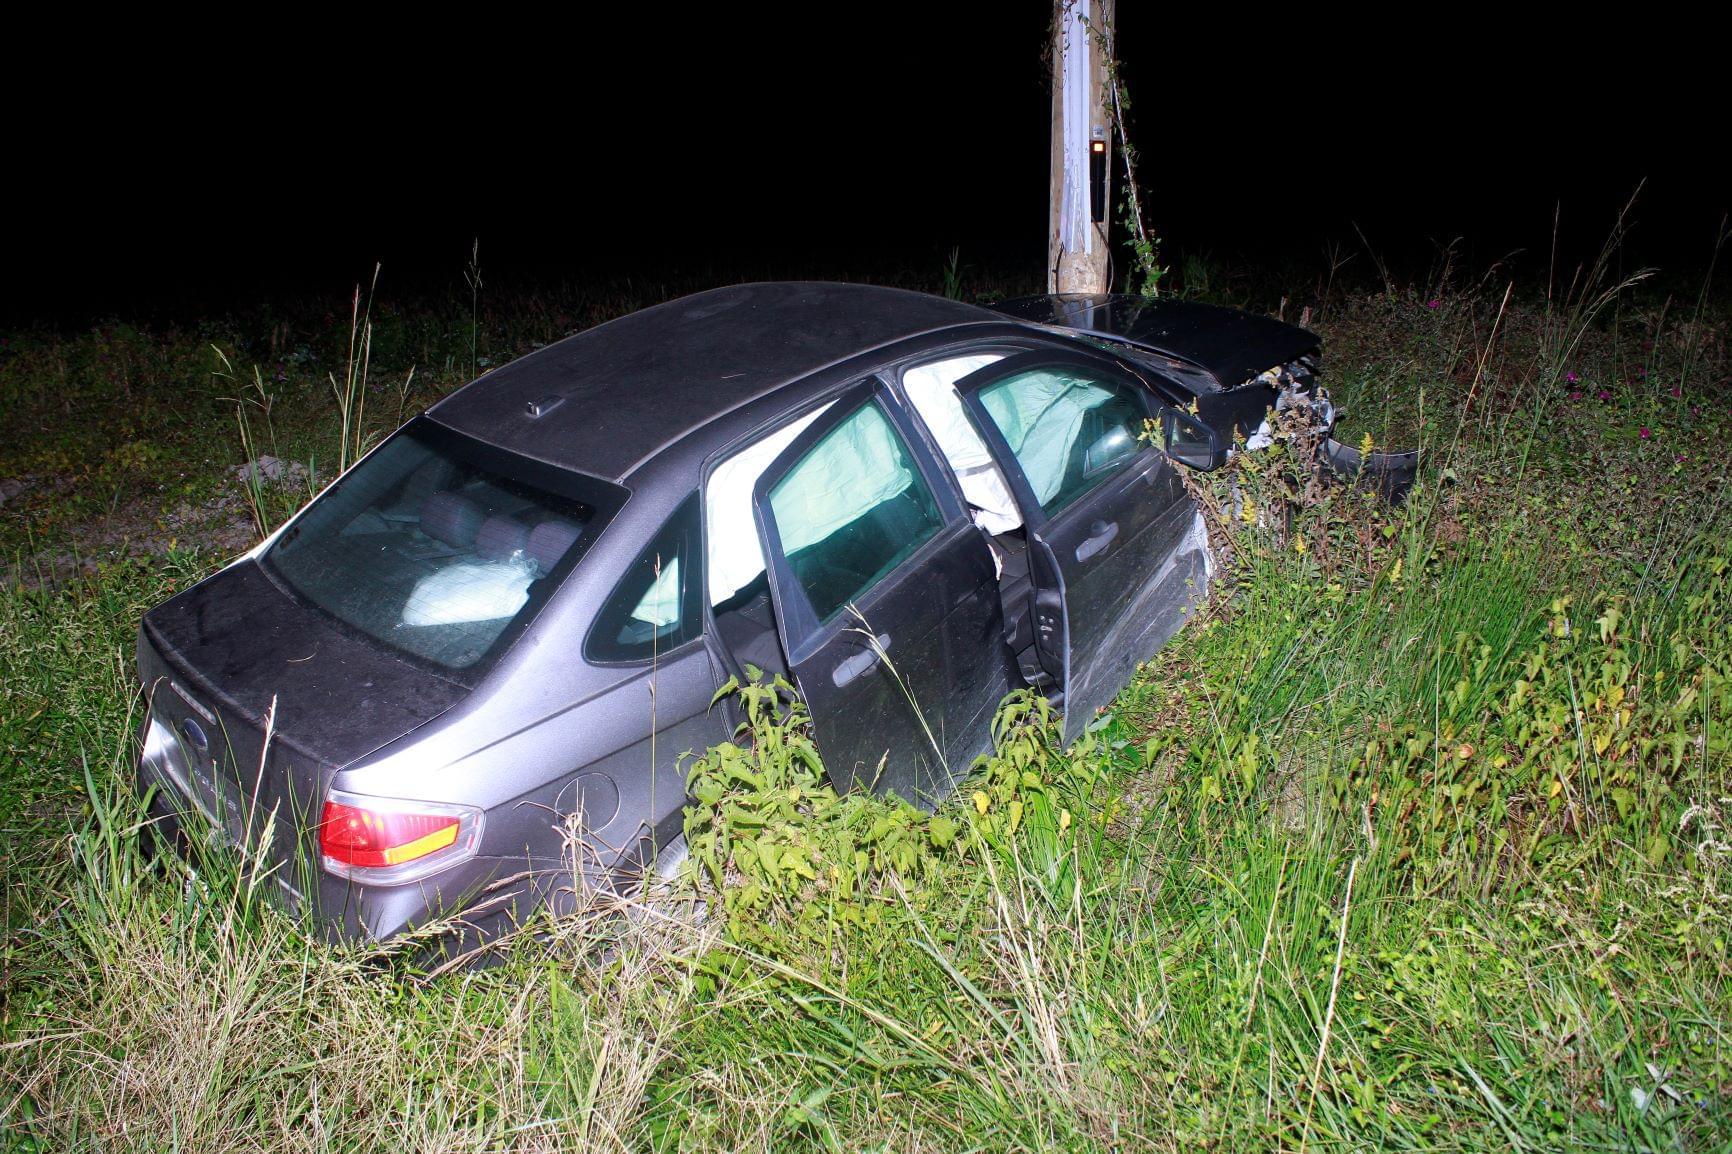 3 Injured In Dudley 2 Car Crash